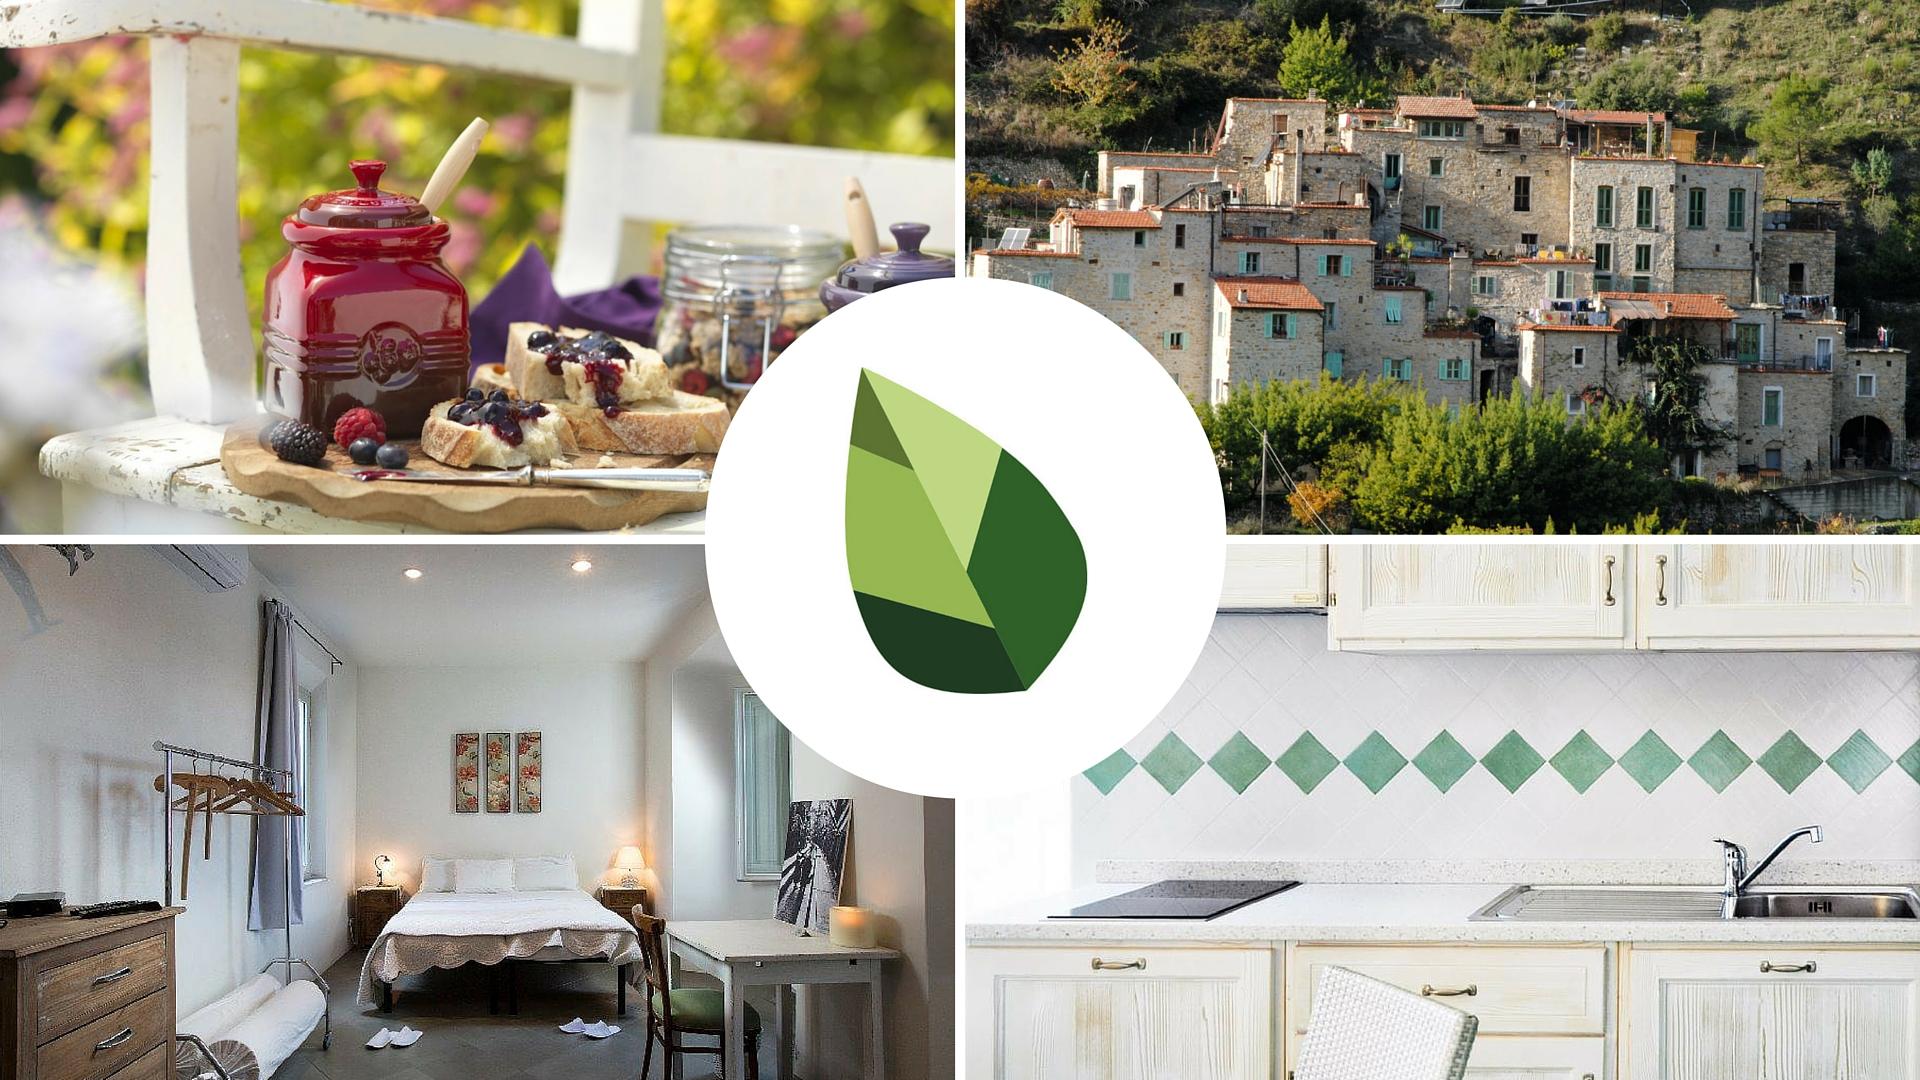 Zero Waste hotels: 4 best practices in Italy